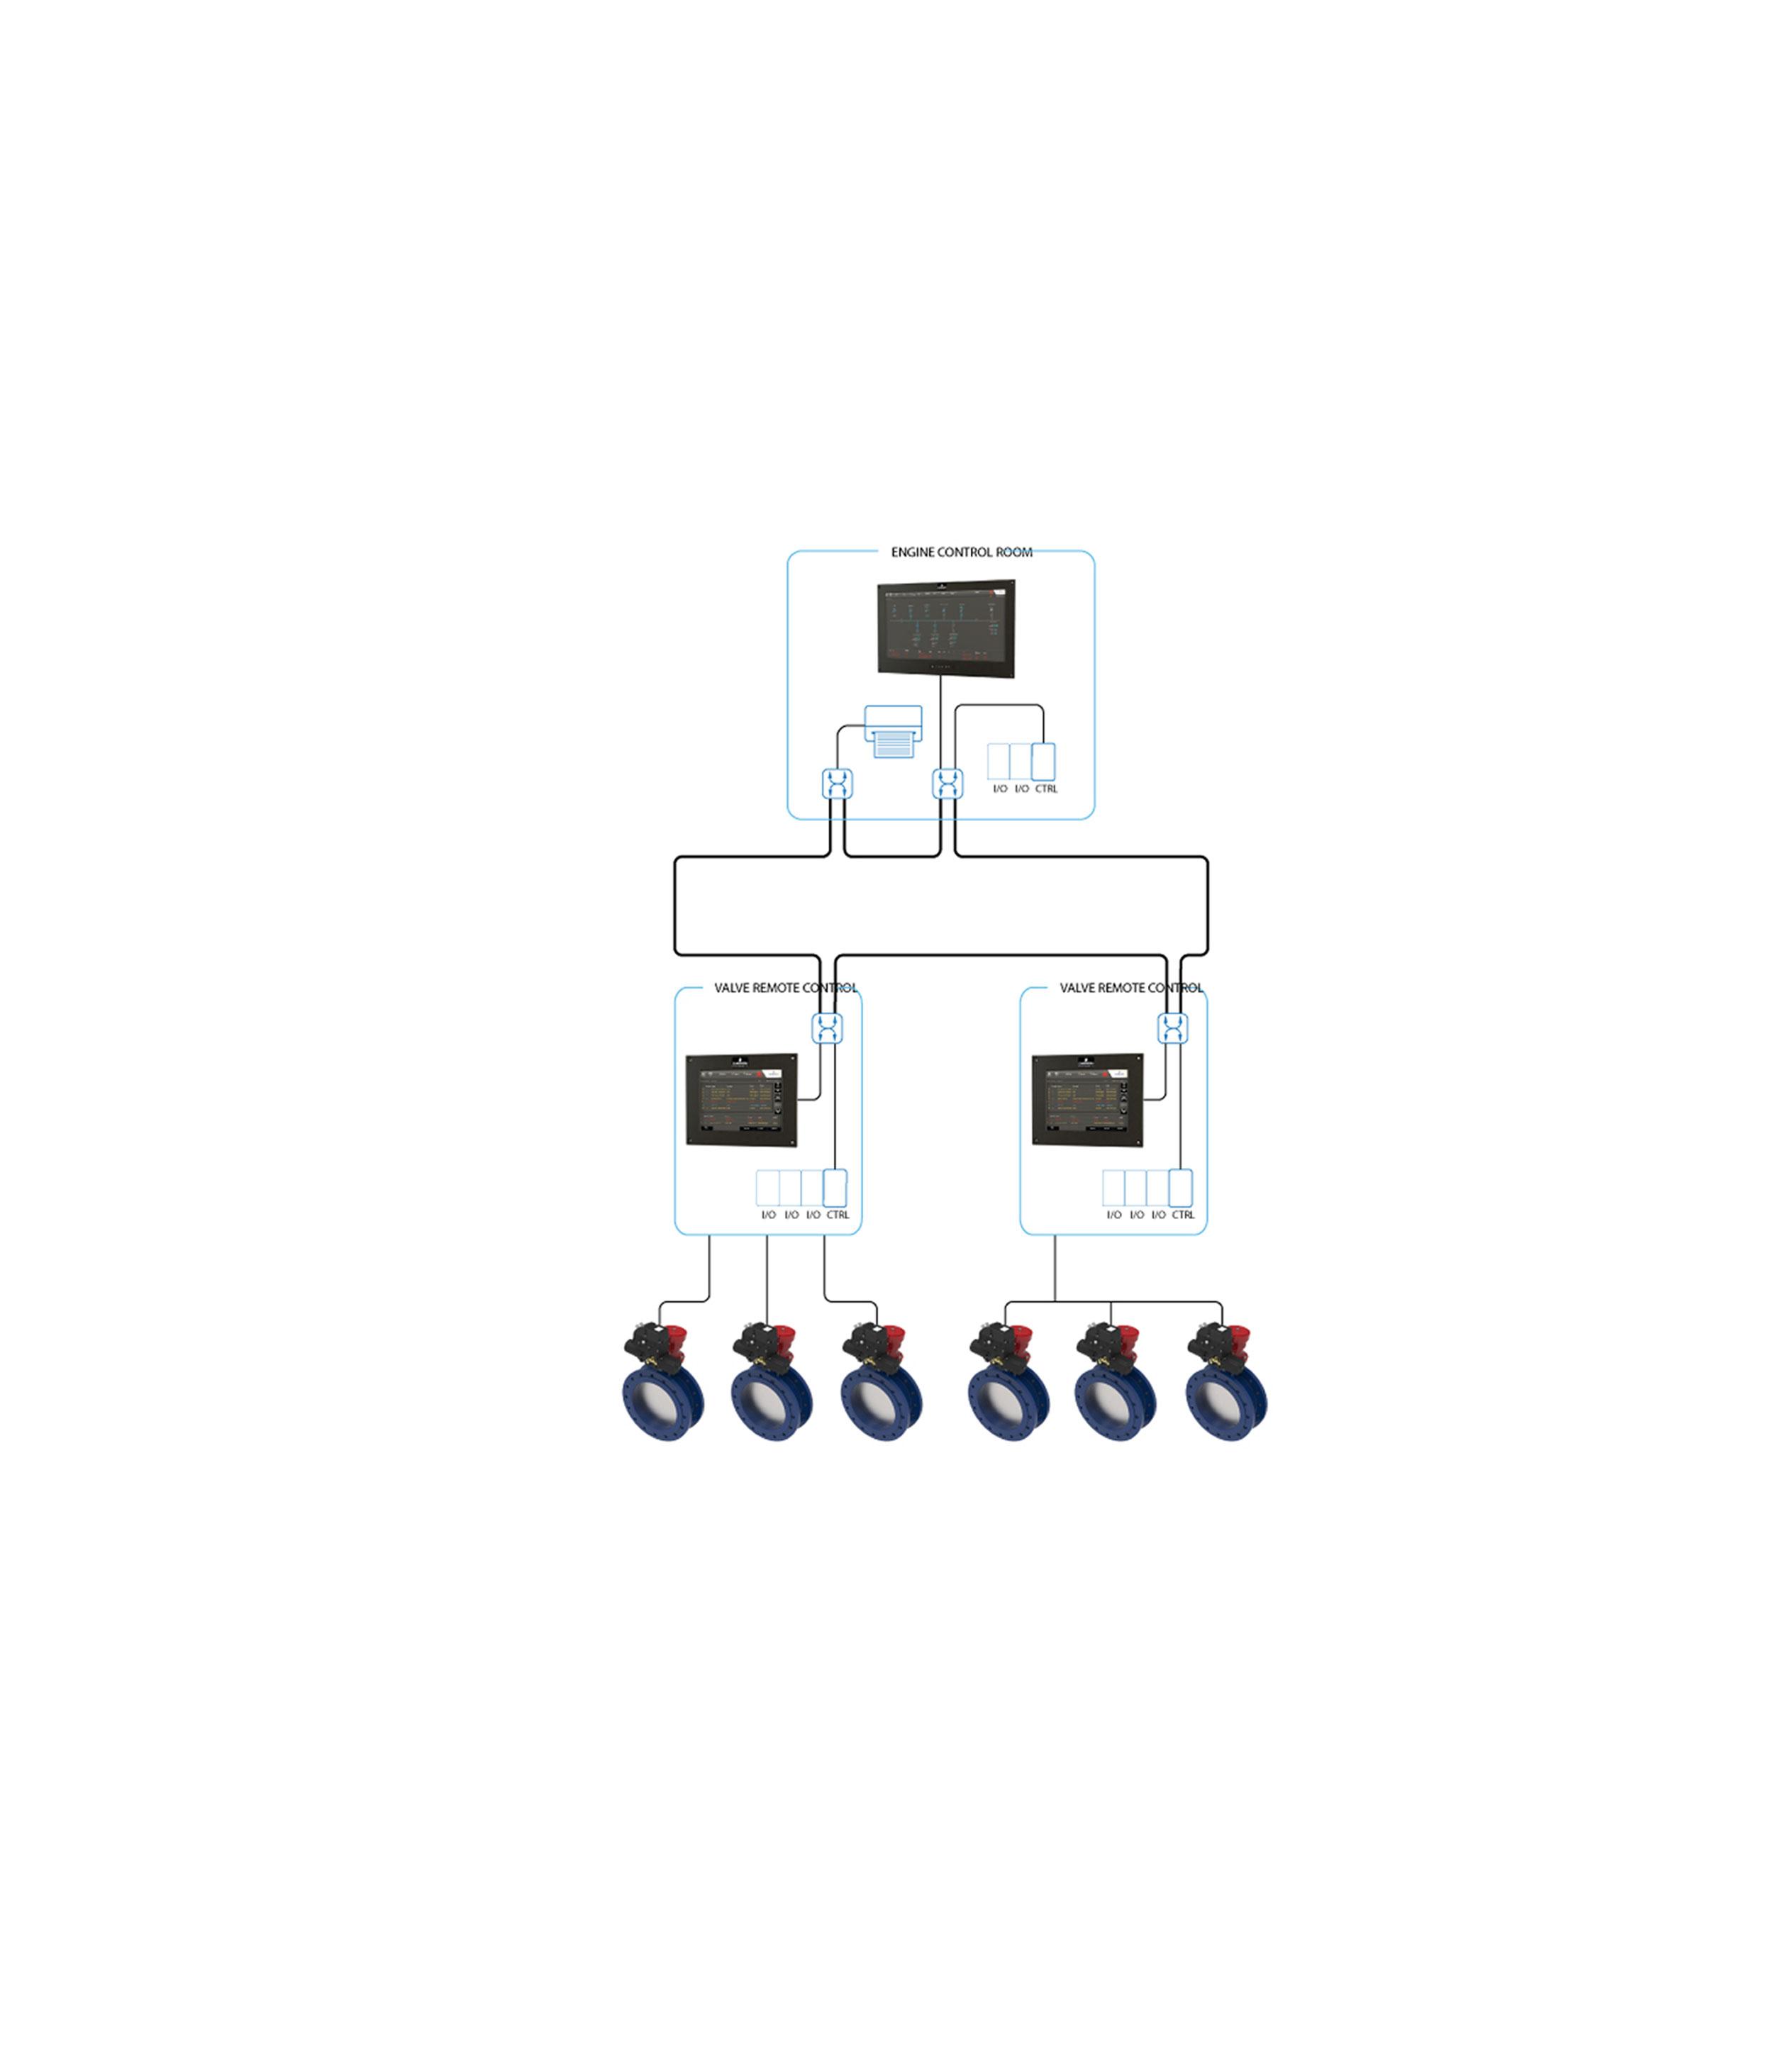 Valve Remote Control Systems | Emerson SG